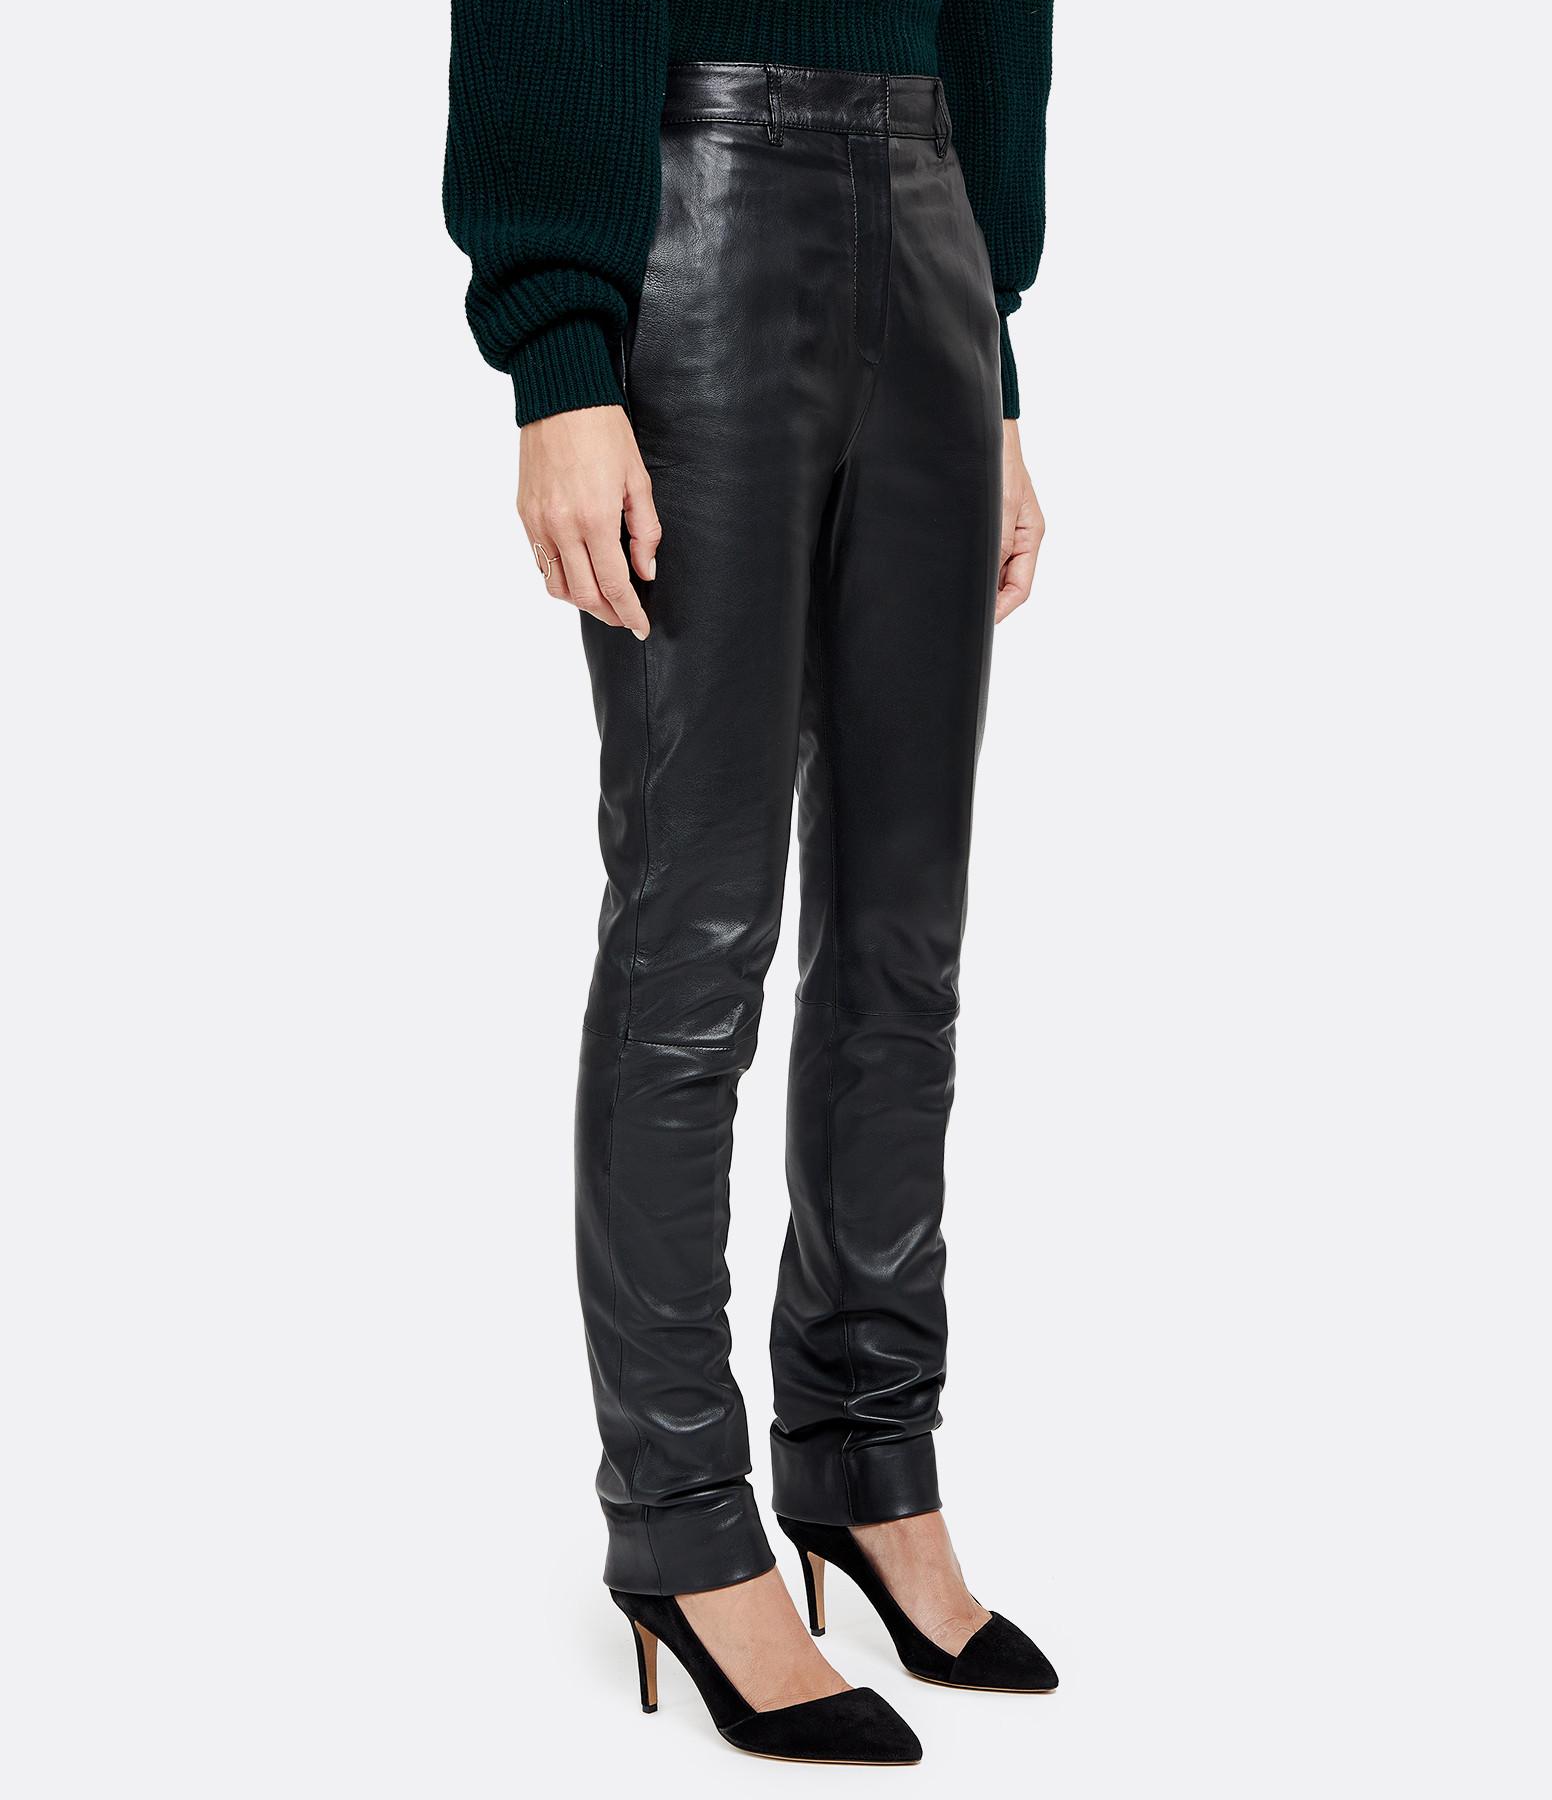 VICTORIA VICTORIA BECKHAM - Pantalon Cuir Noir